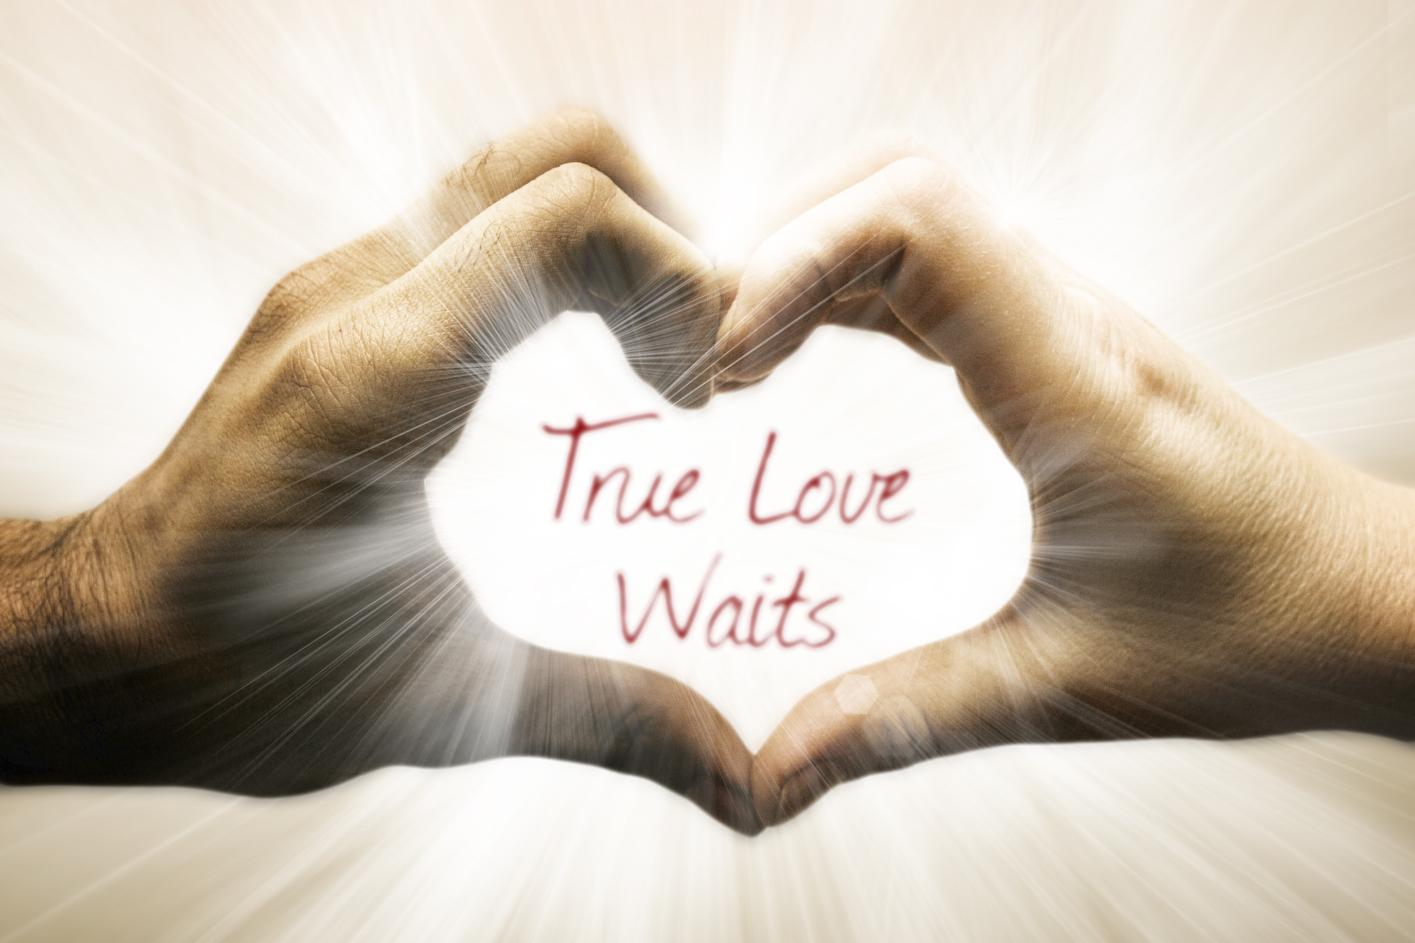 essay on true love waits